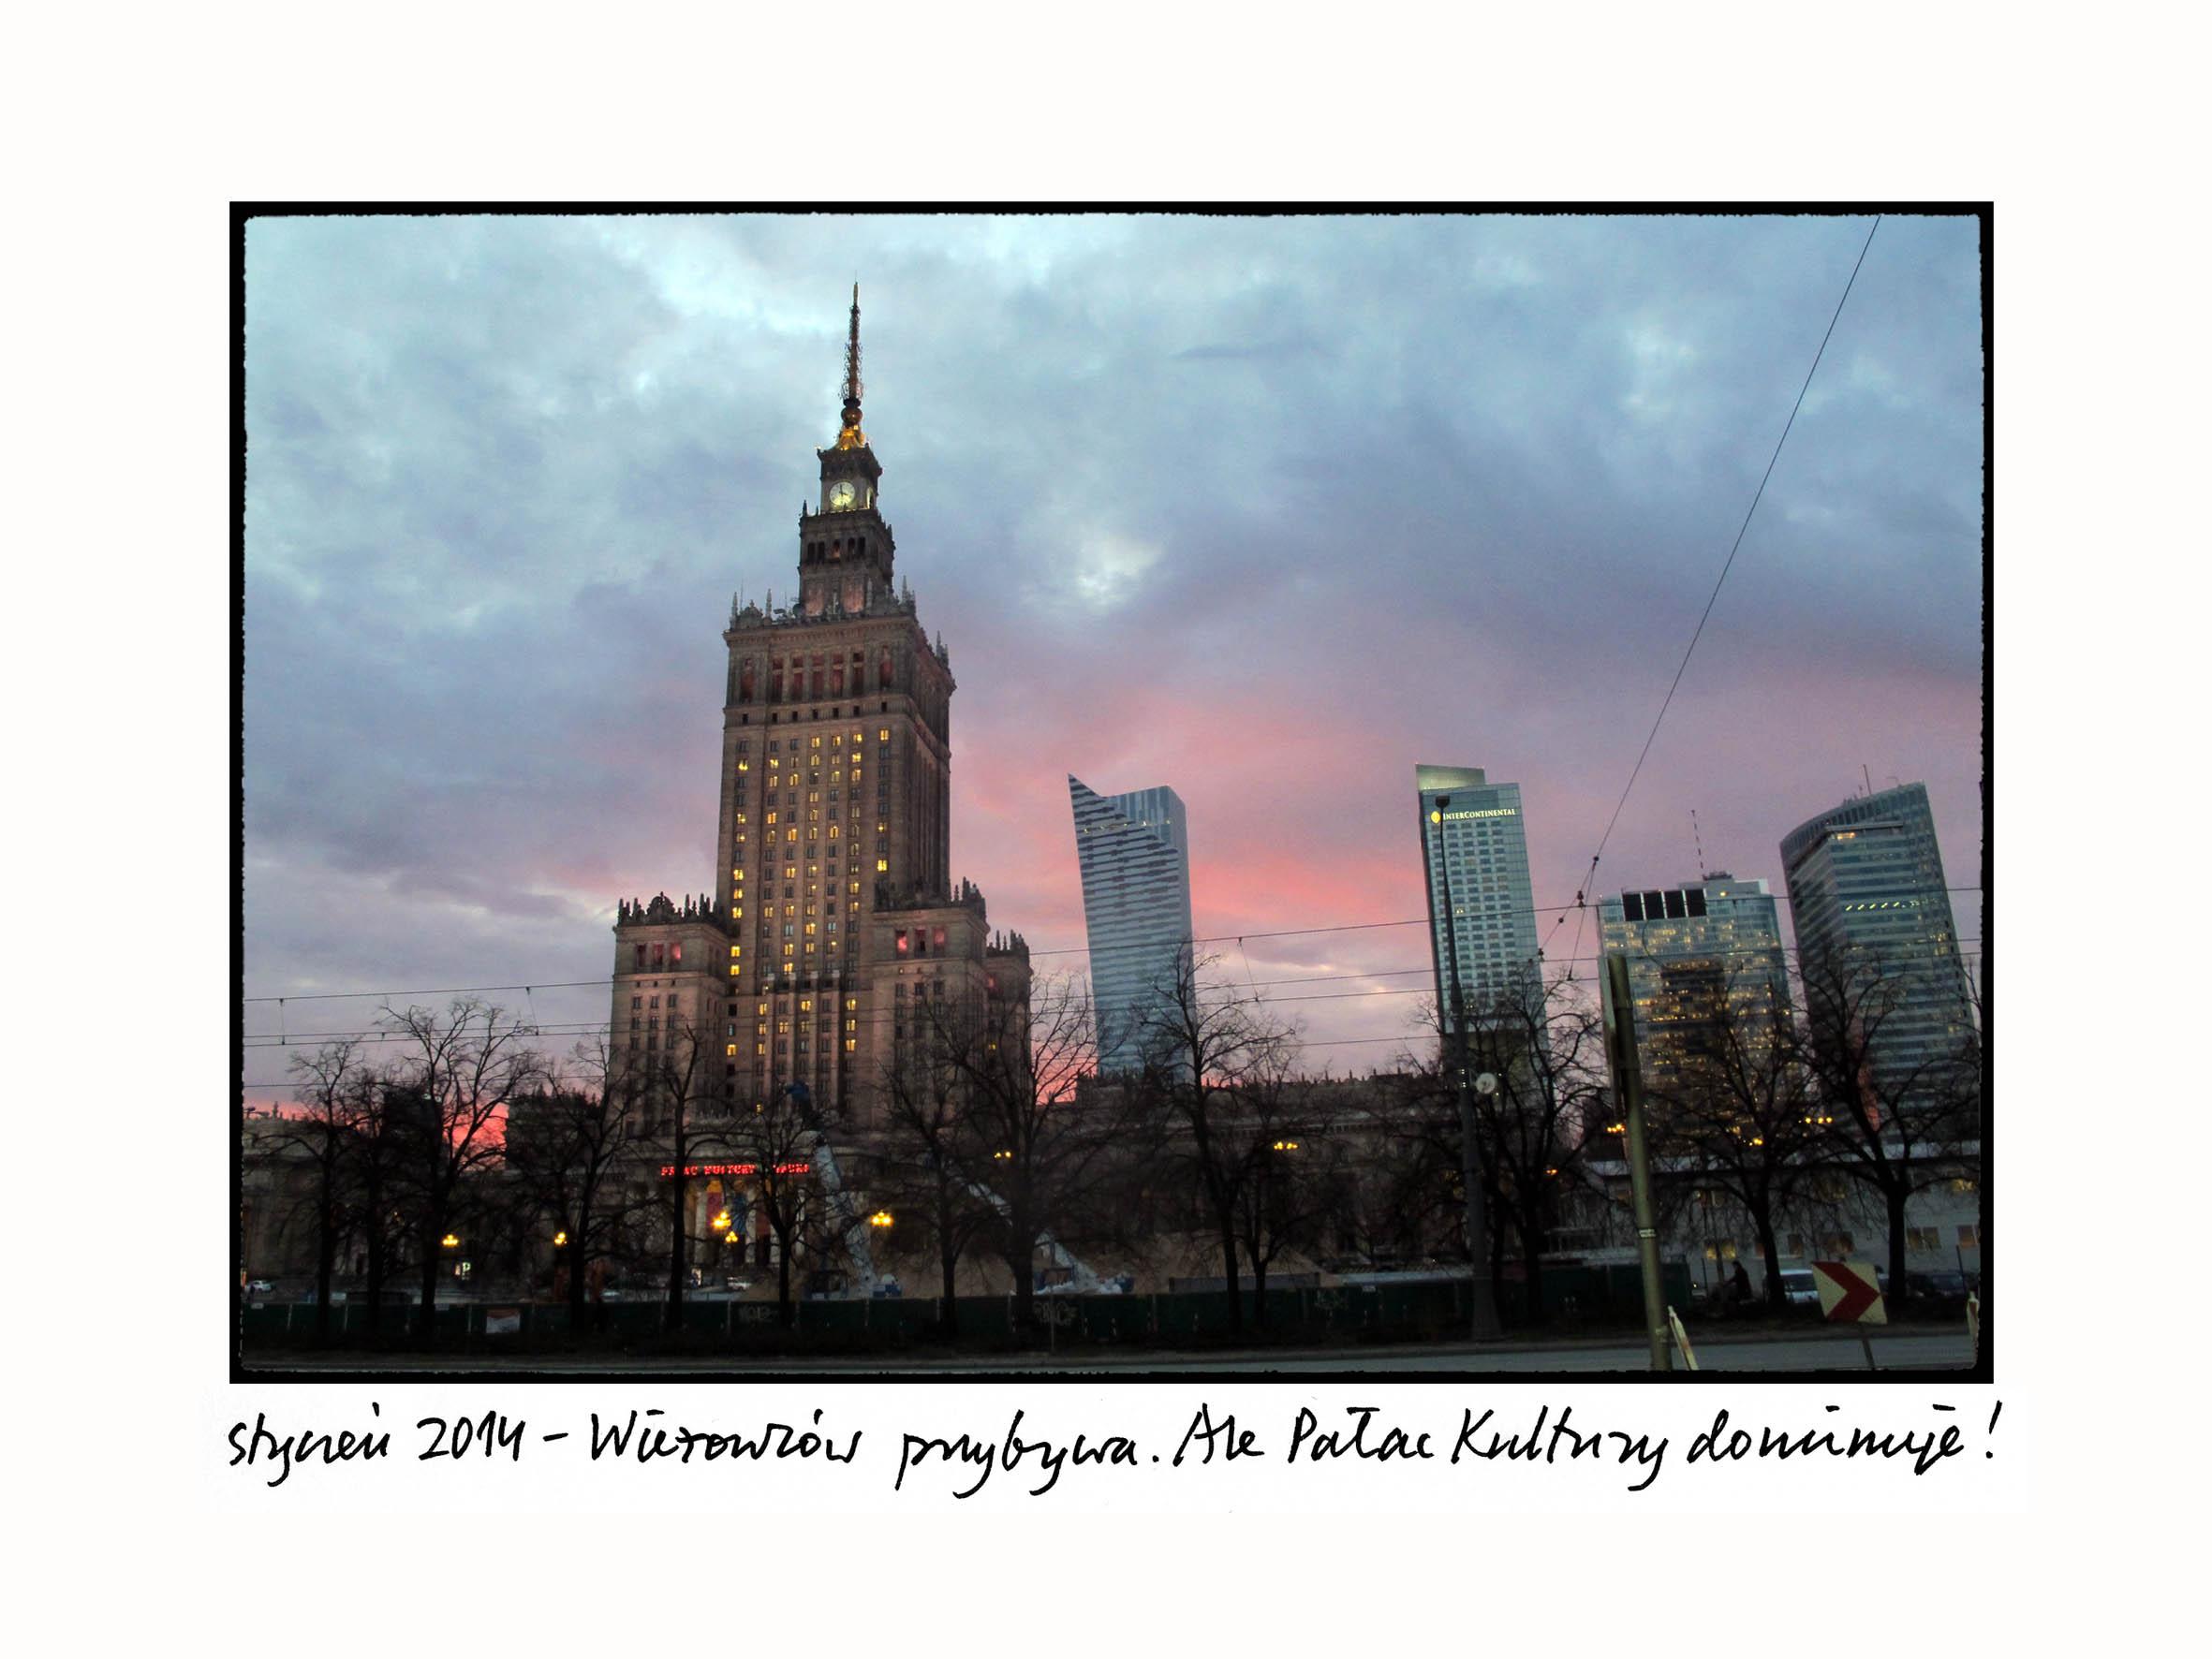 styczeń 2014 - Wieżowców przybywa. Ale Pałac          Kultury dominuje! / 2014 január - Egyre több felhőkarcoló.          De még a Kultúrpalota dominál!